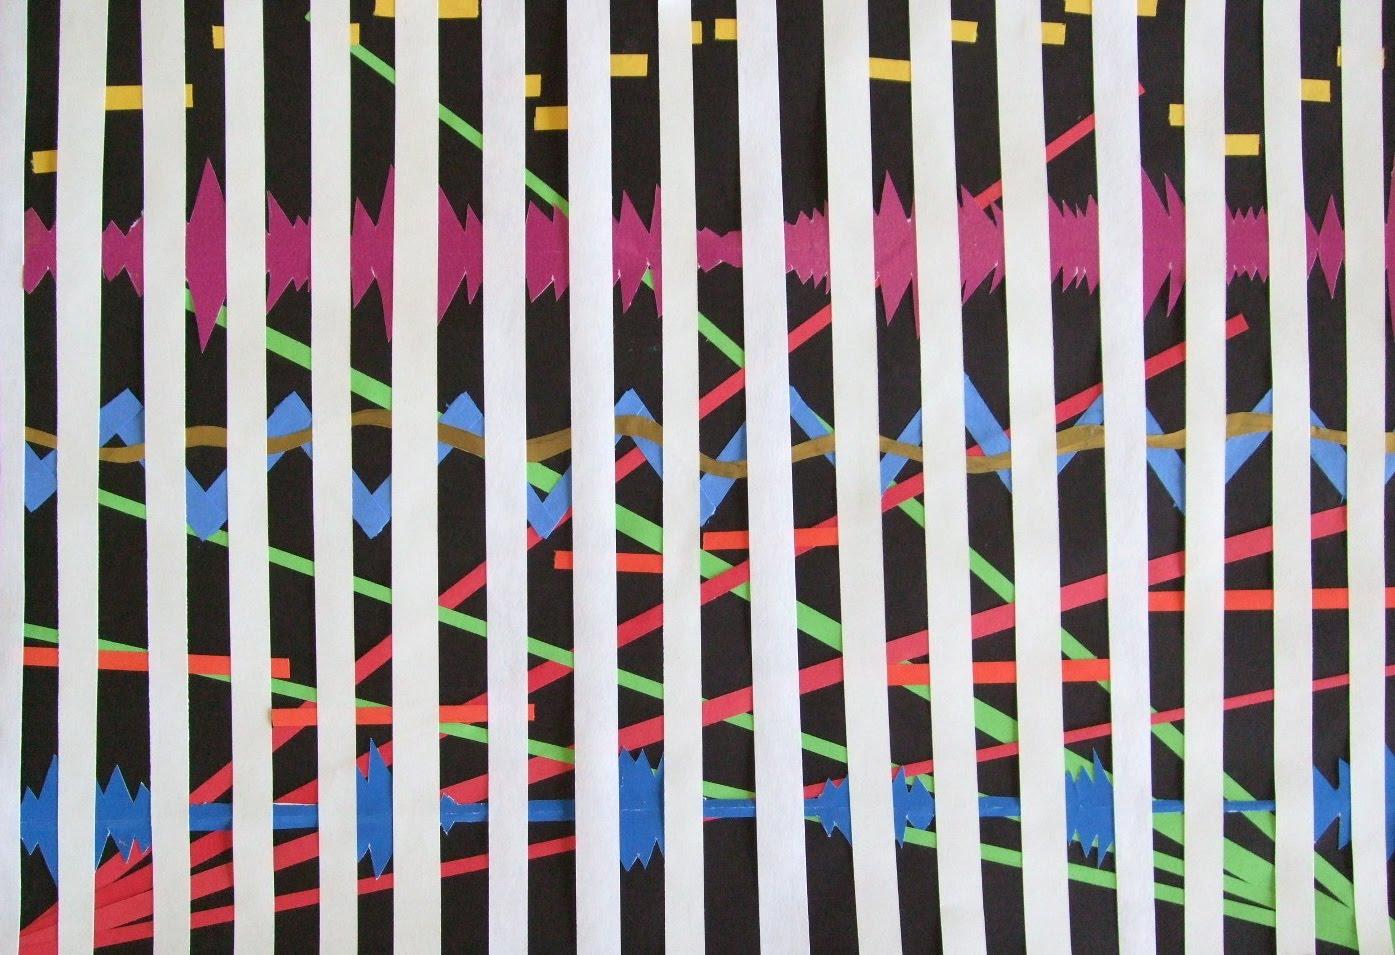 highschoolart: Paper Cut High School Art - photo#22